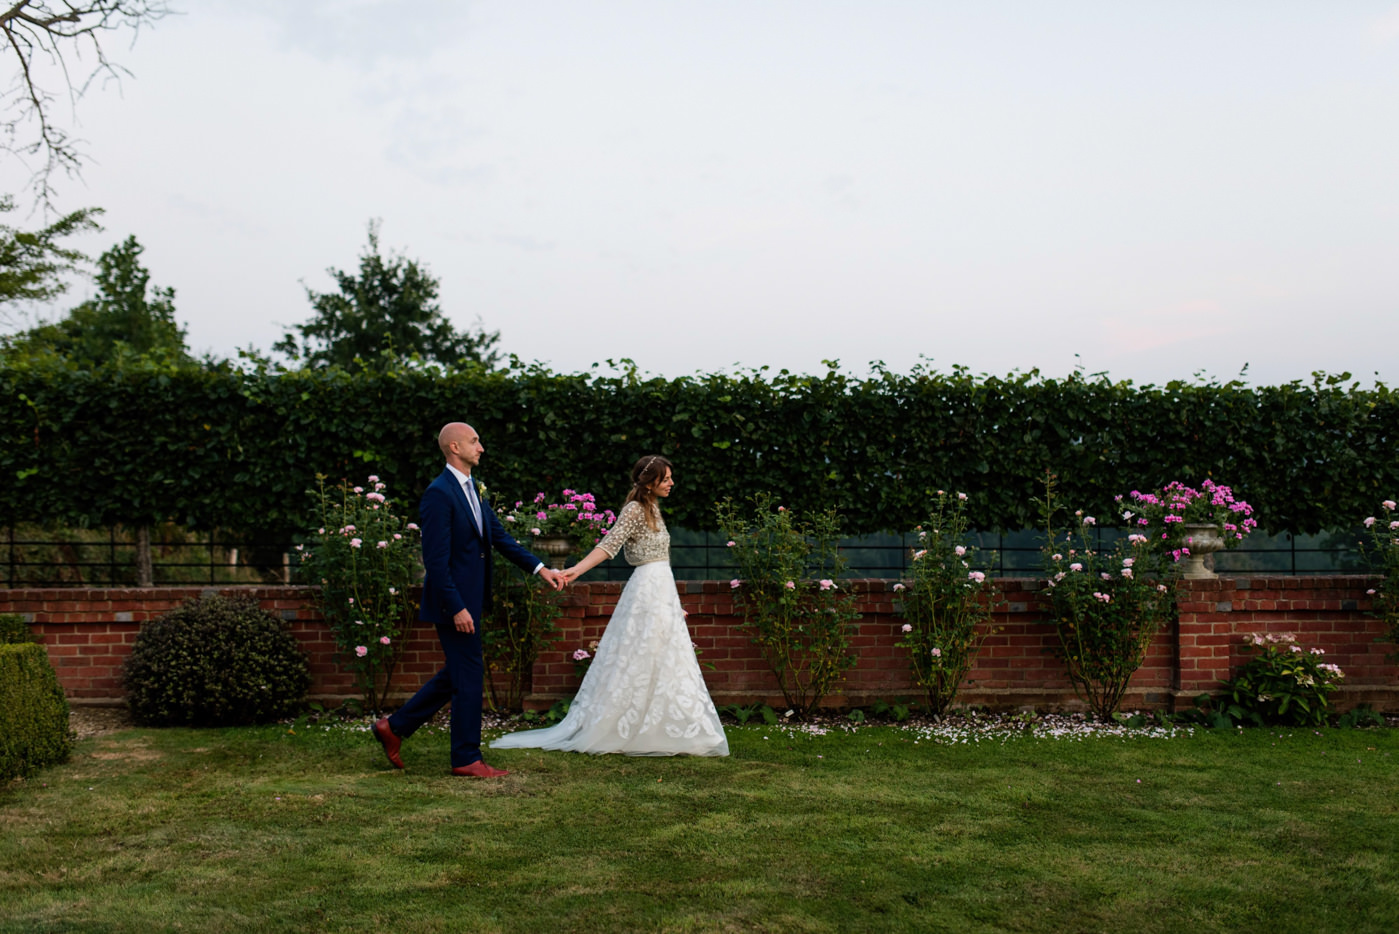 Gorgeous bride Robyn wore a wedding dress by Halfpenny London